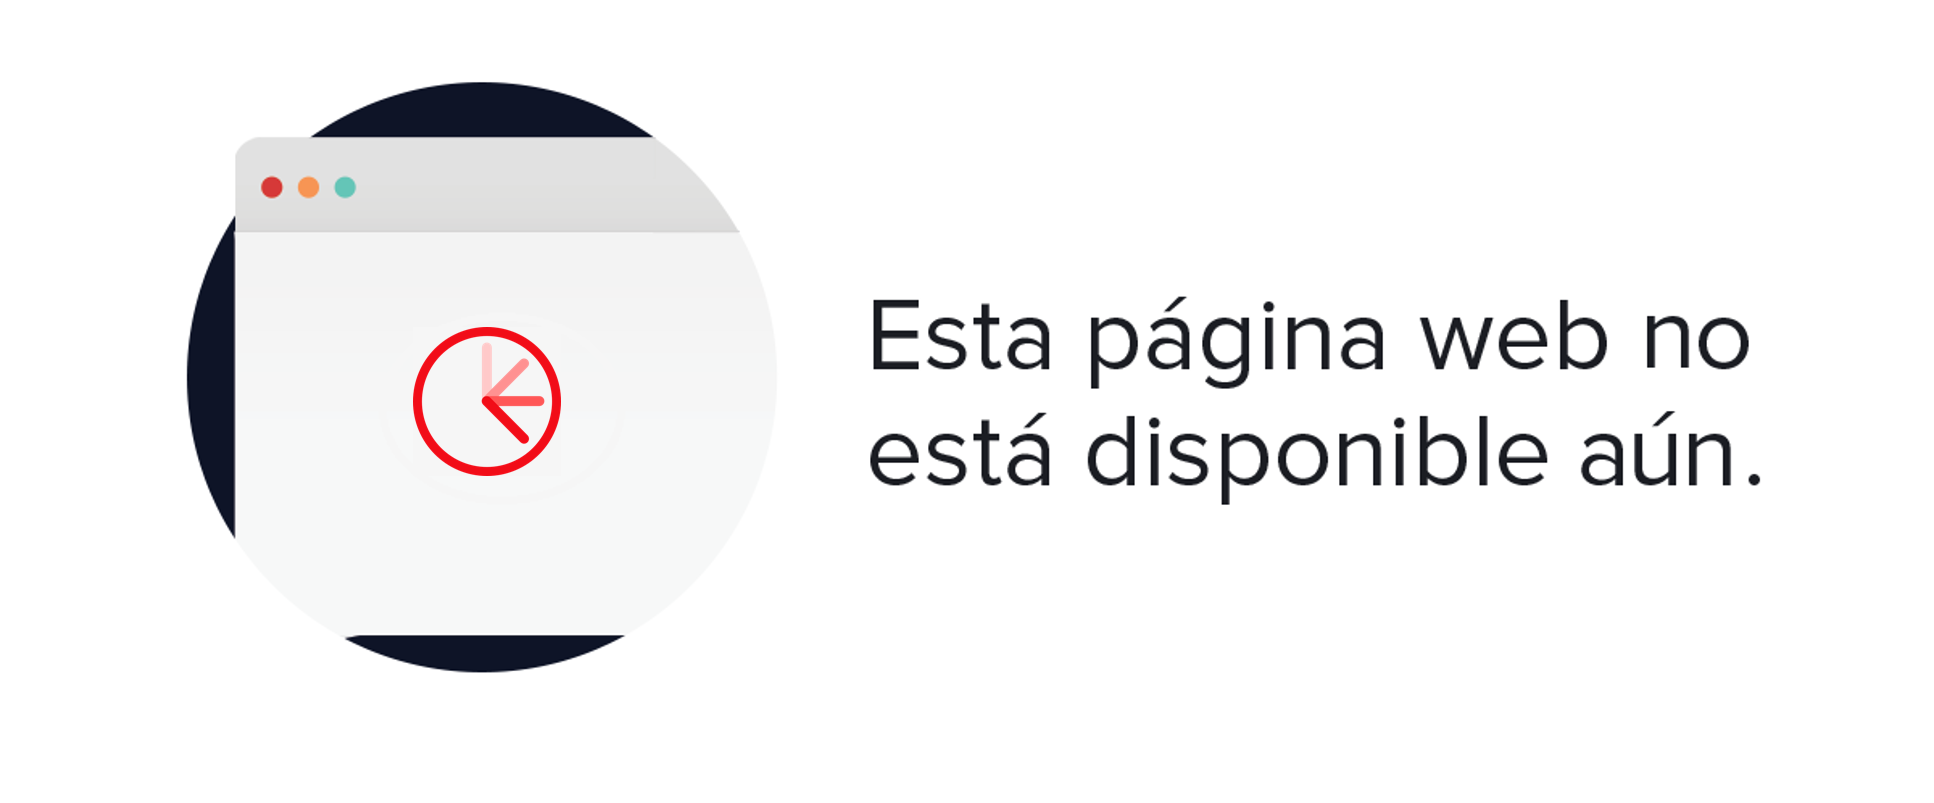 Lamparas Bajo Consumo Para Baño:Masluz – Lámparas en Zaragoza